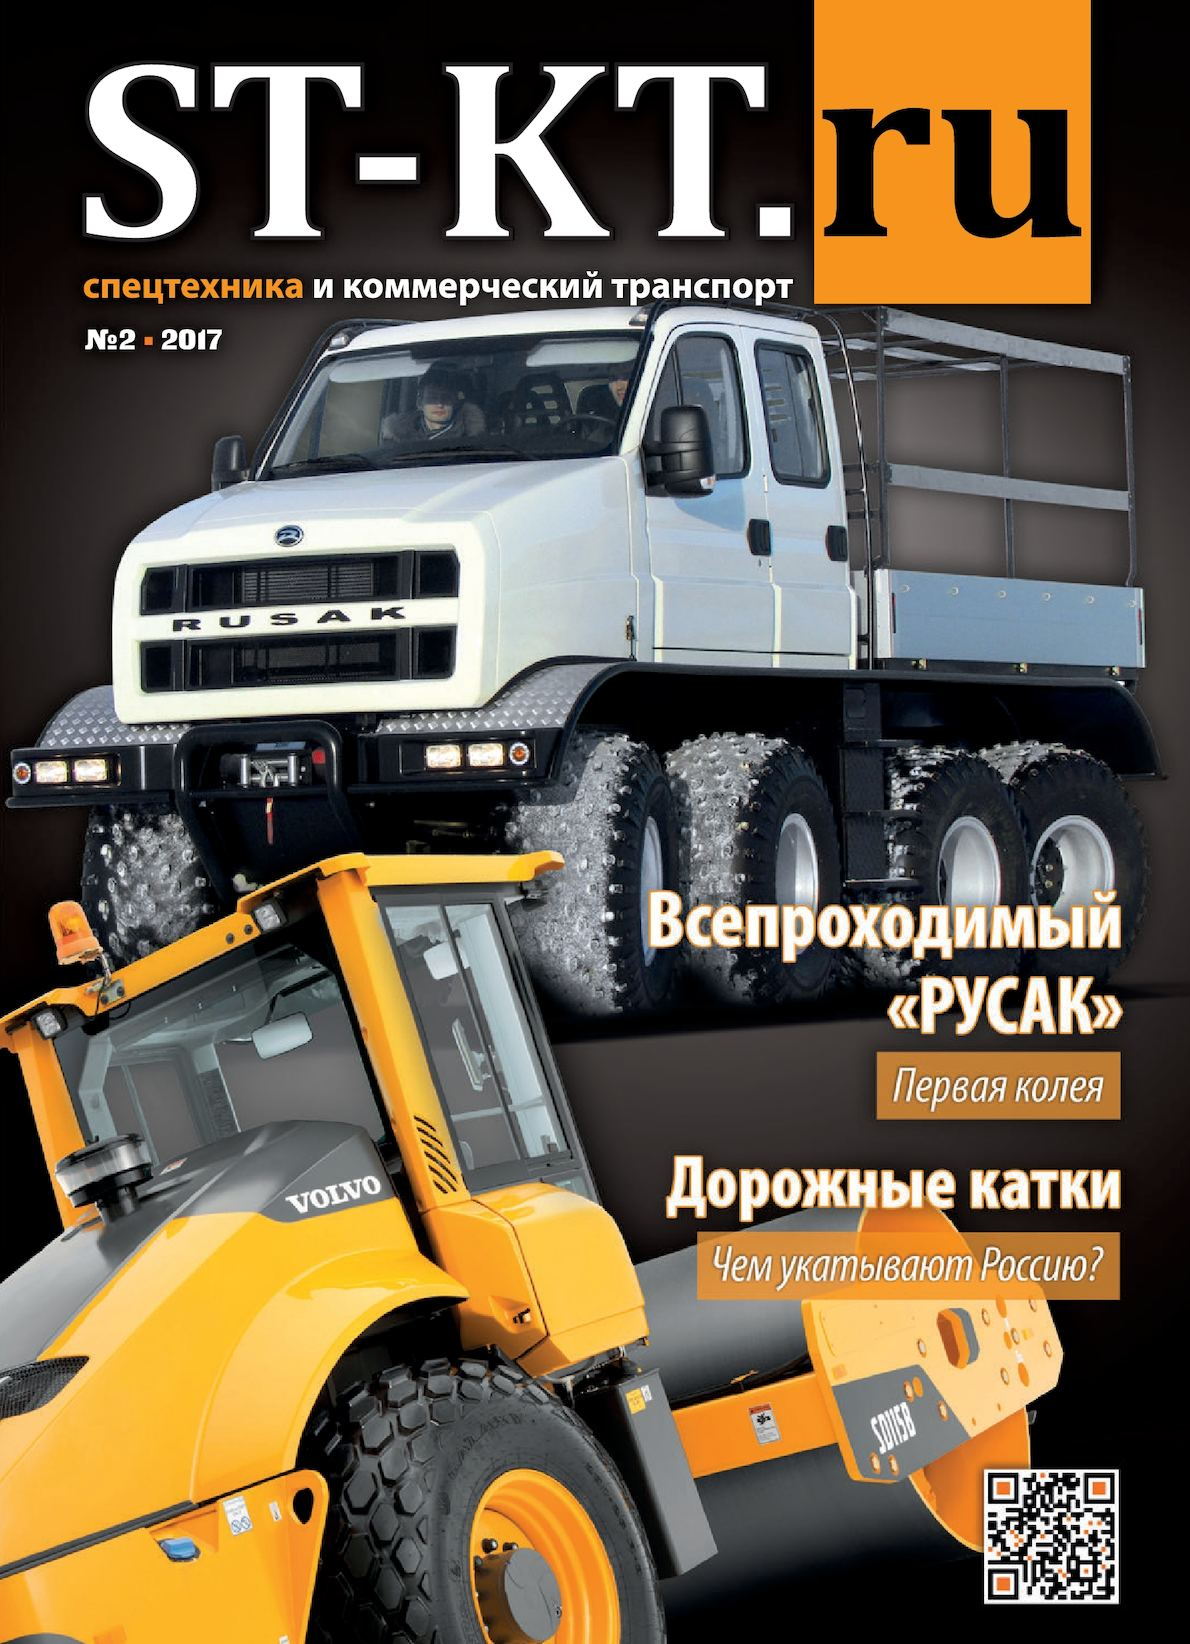 СпецТехника и Коммерческий Транспорт №2/2017